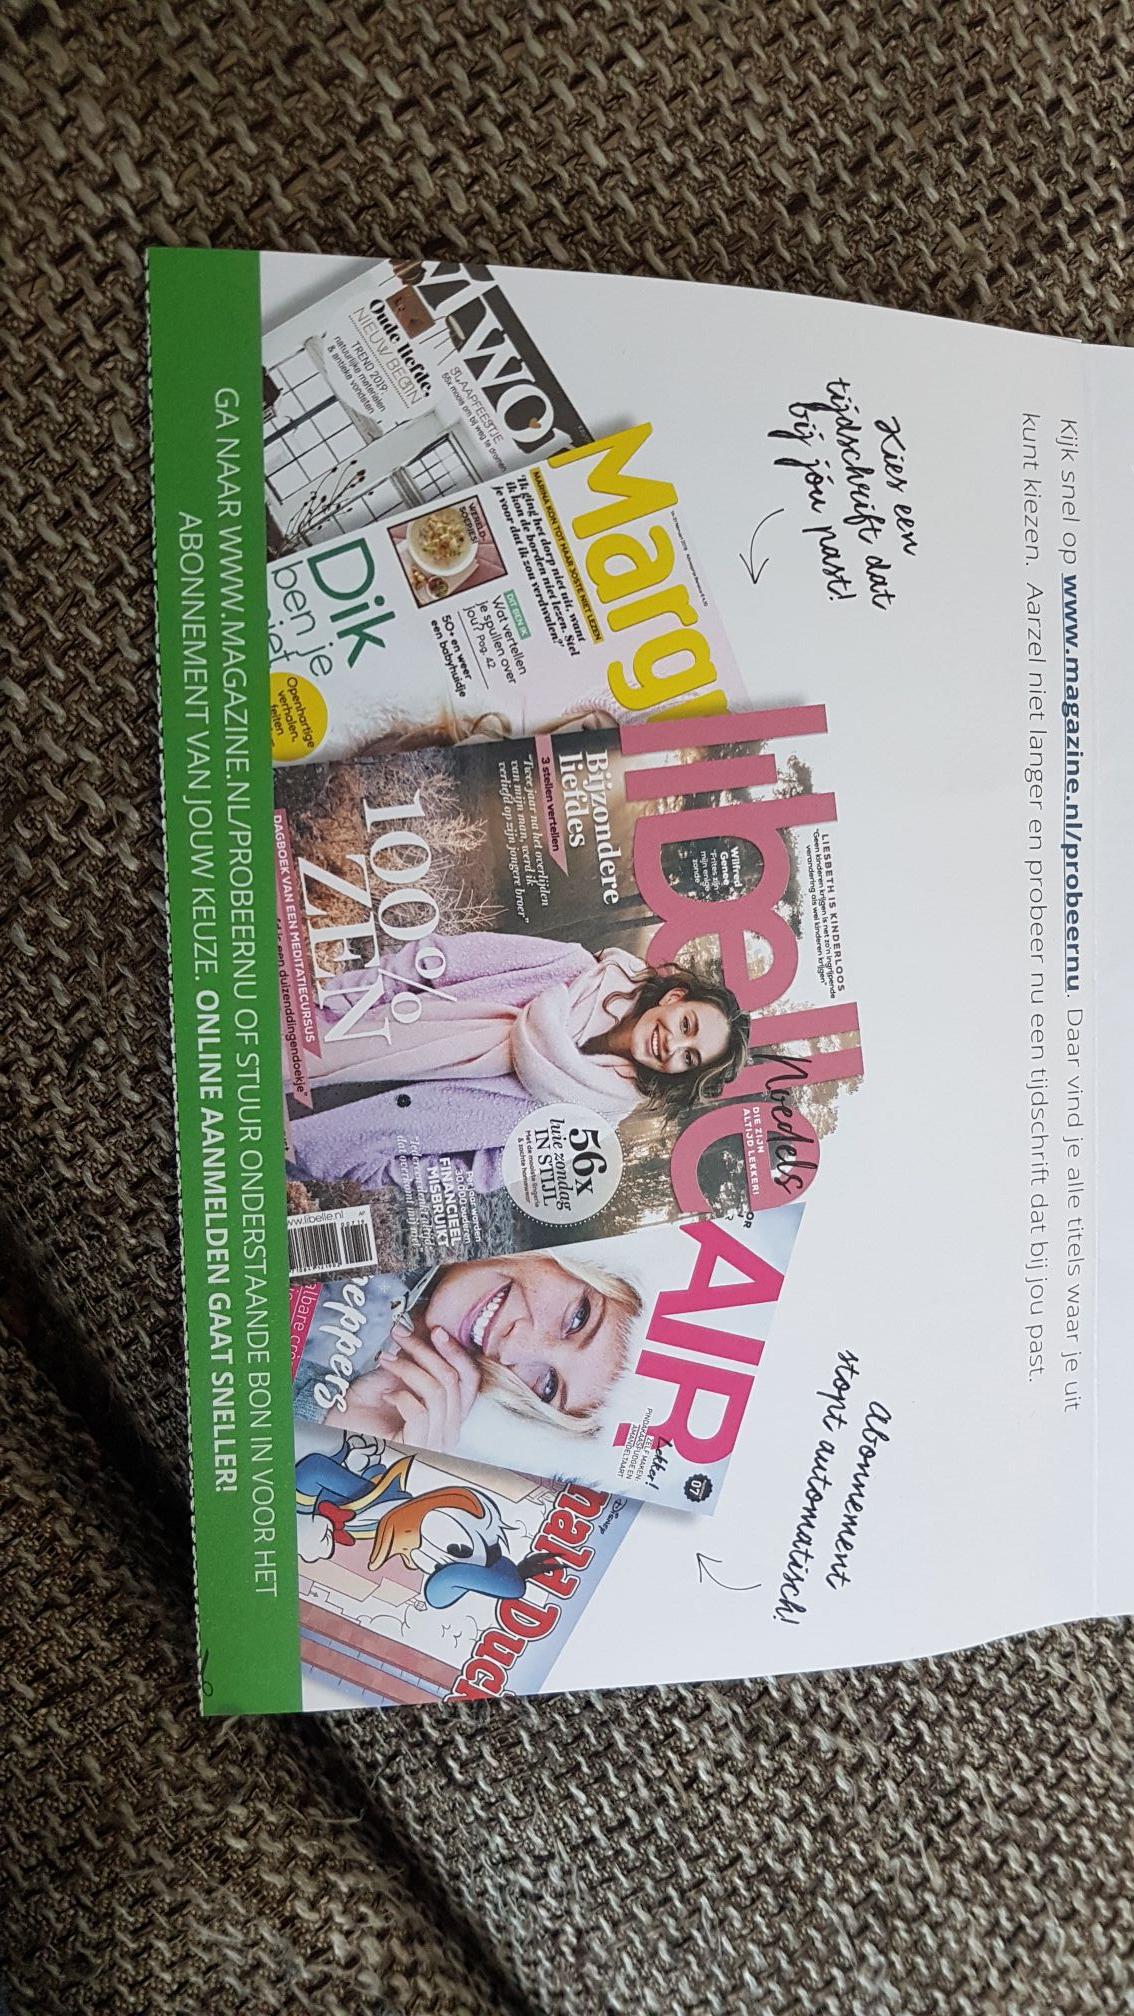 Mini tijdschrift abonnement. Tot 85% korting